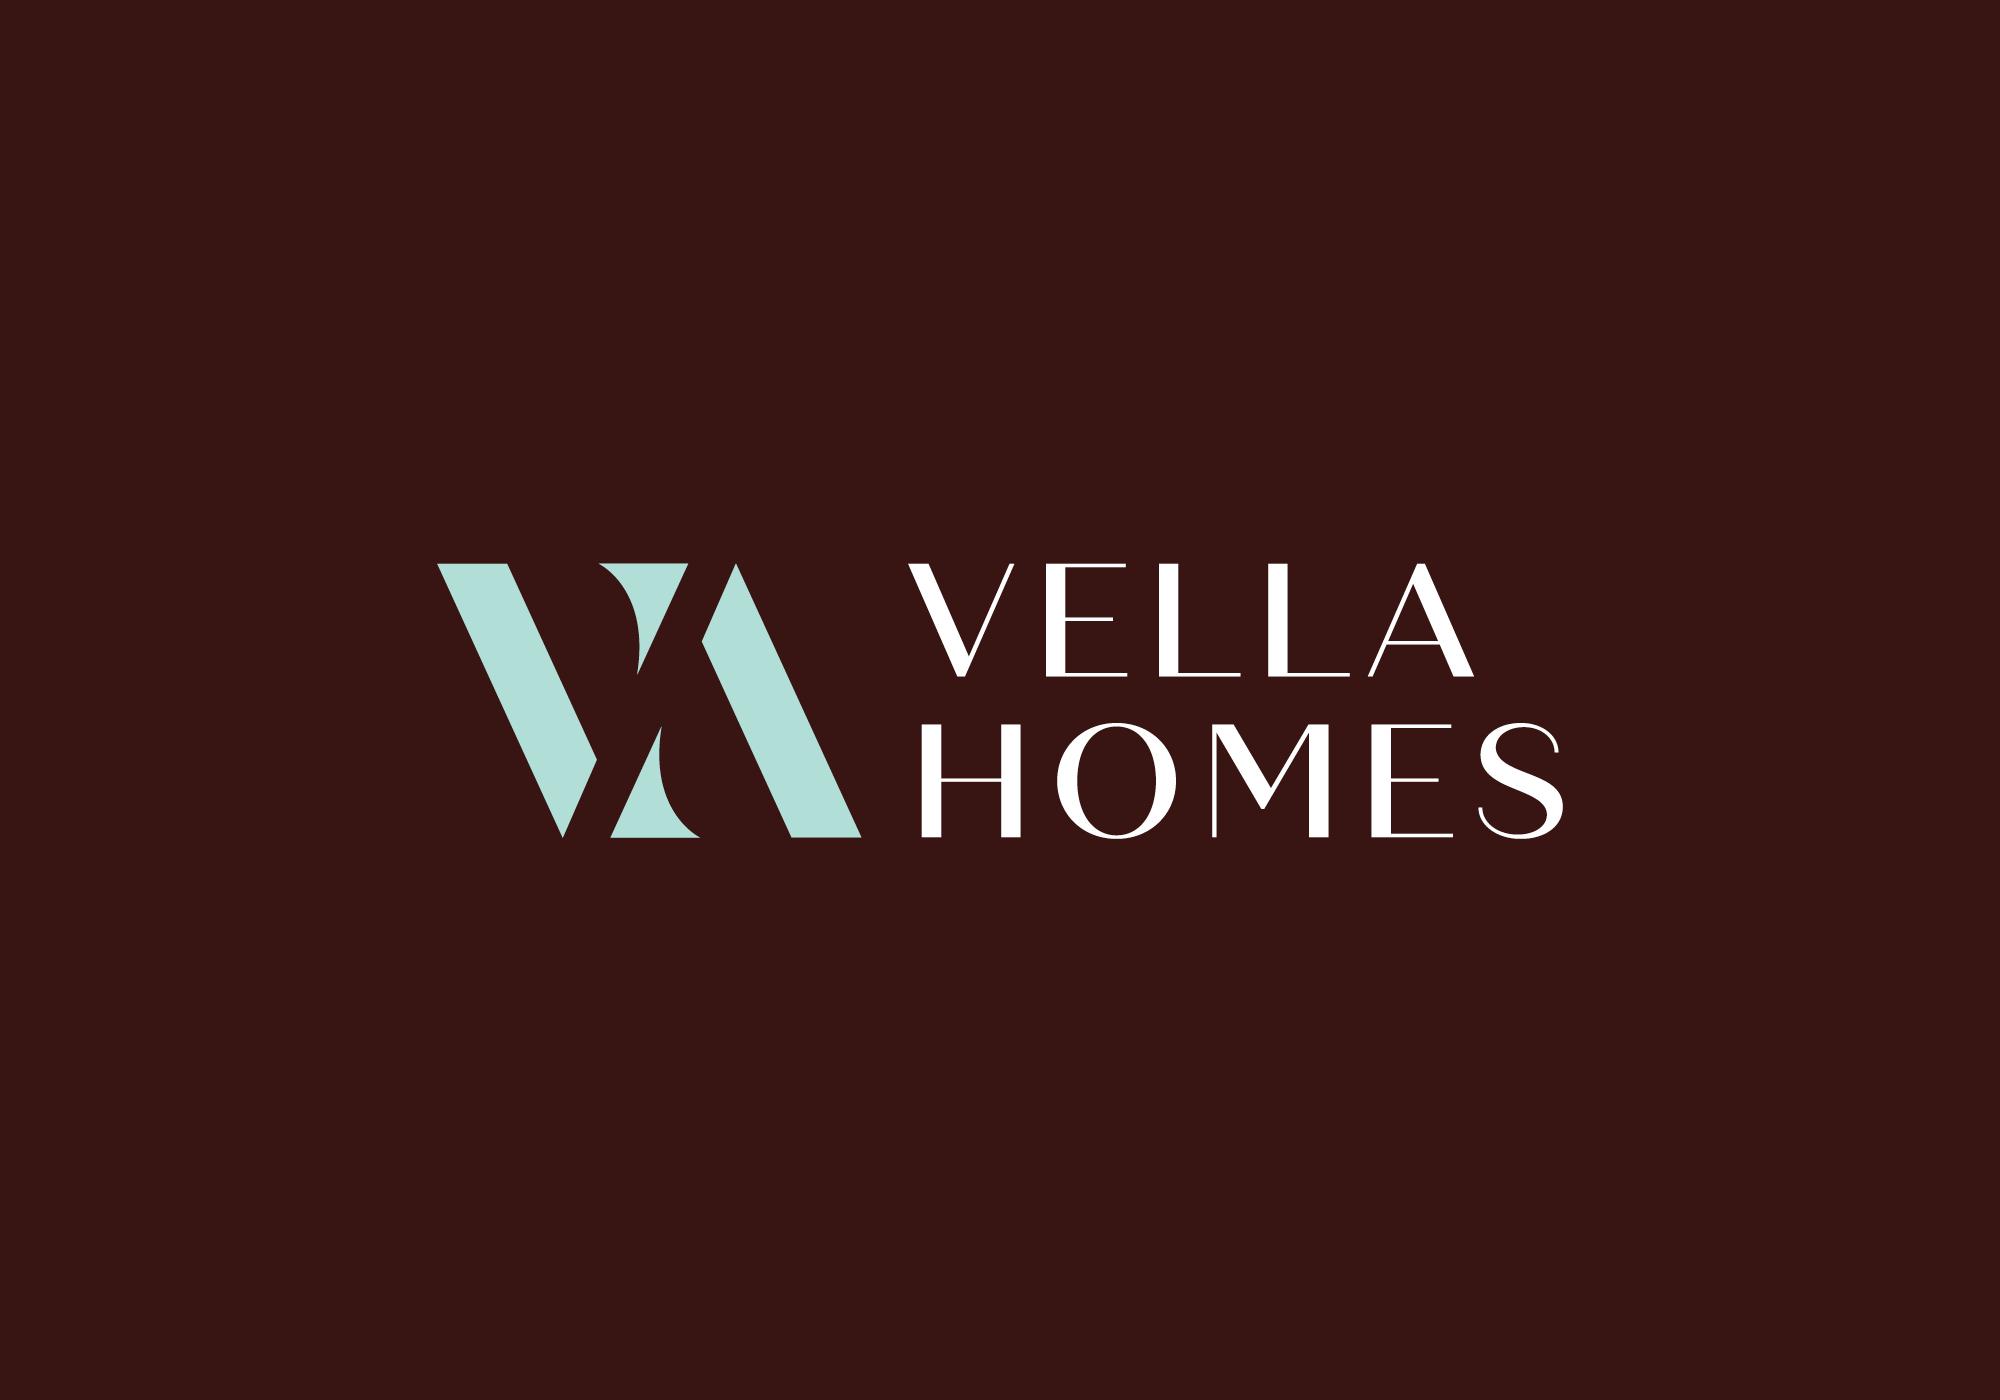 Cover image: Vella Homes